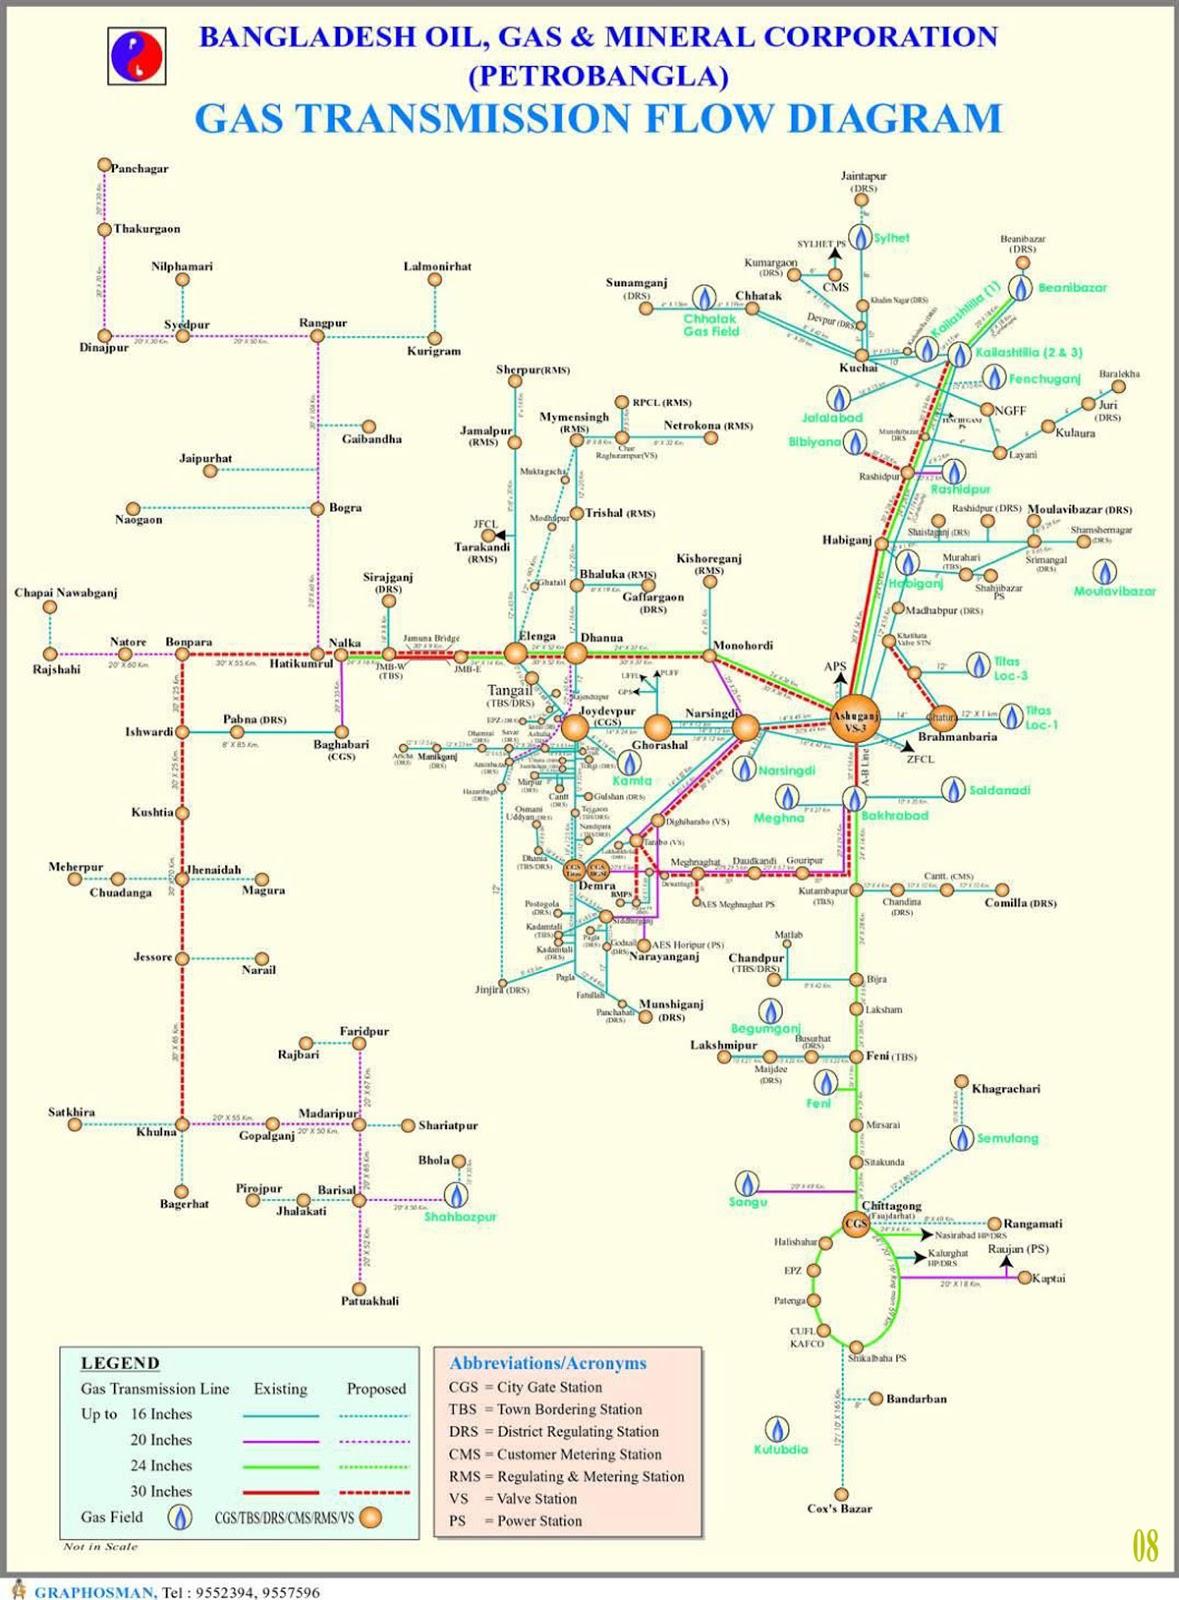 Gas Transmission Flow Diagram Bangladesh